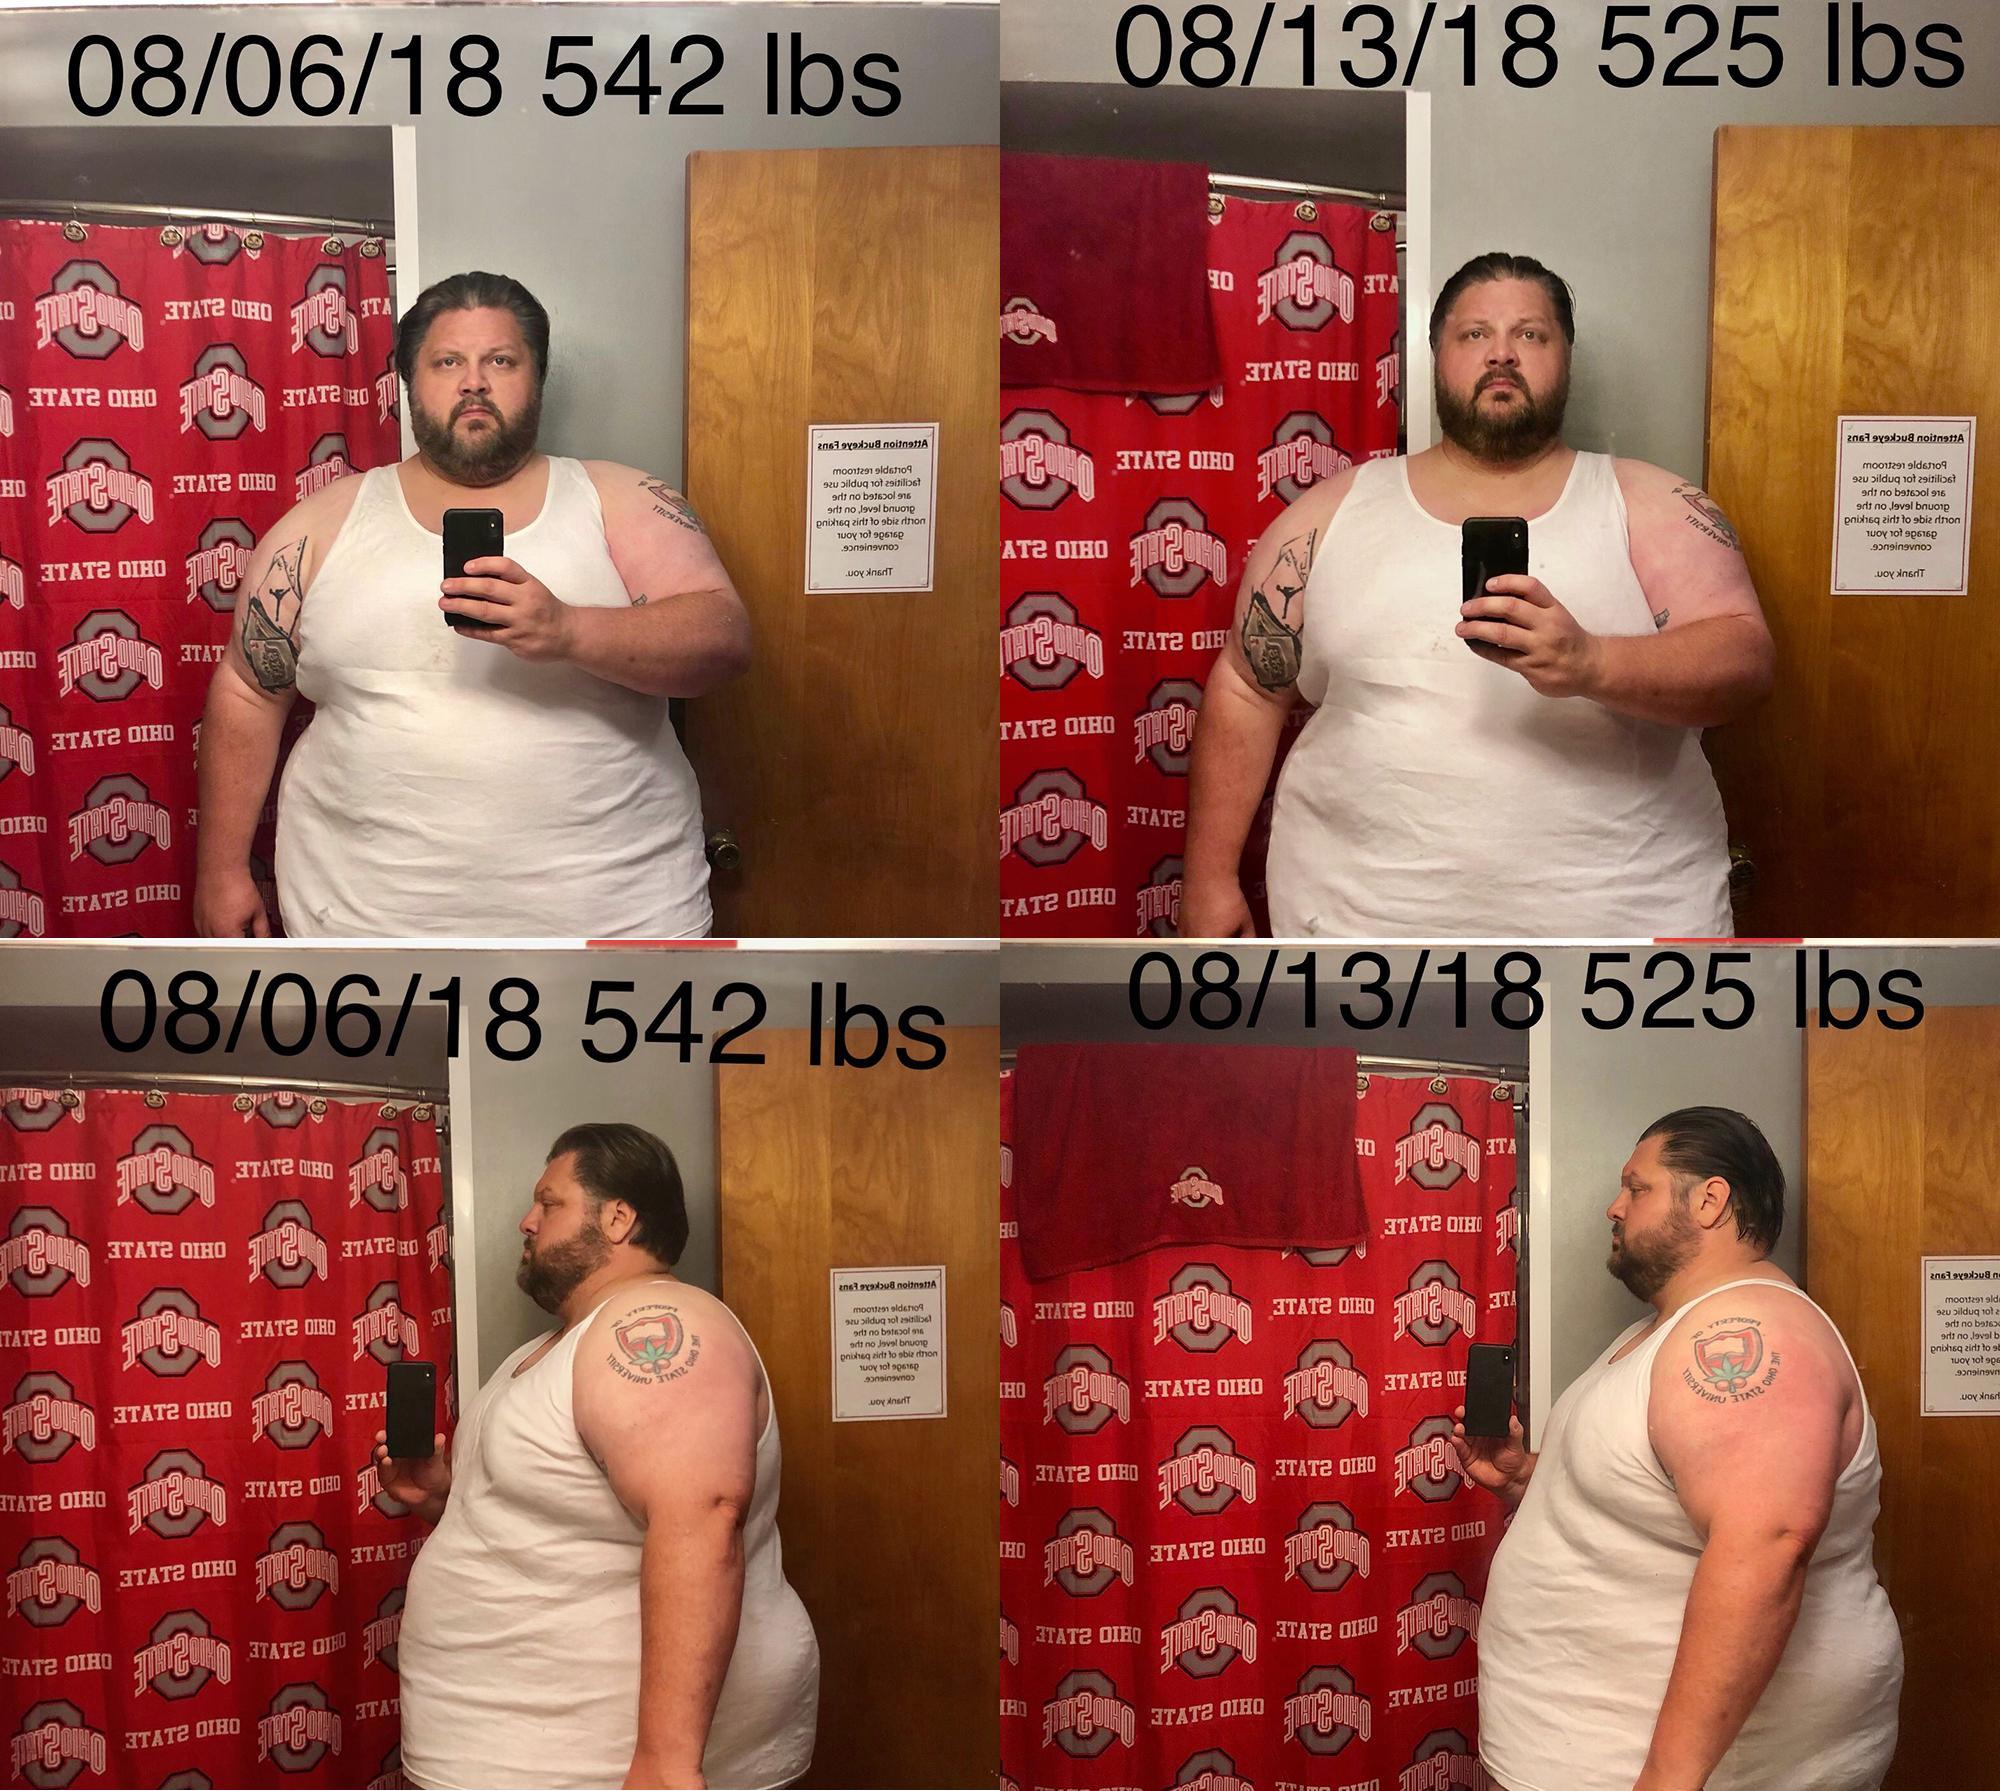 Progress Pics of 17 lbs Weight Loss 6 feet 1 Male 542 lbs to 525 lbs